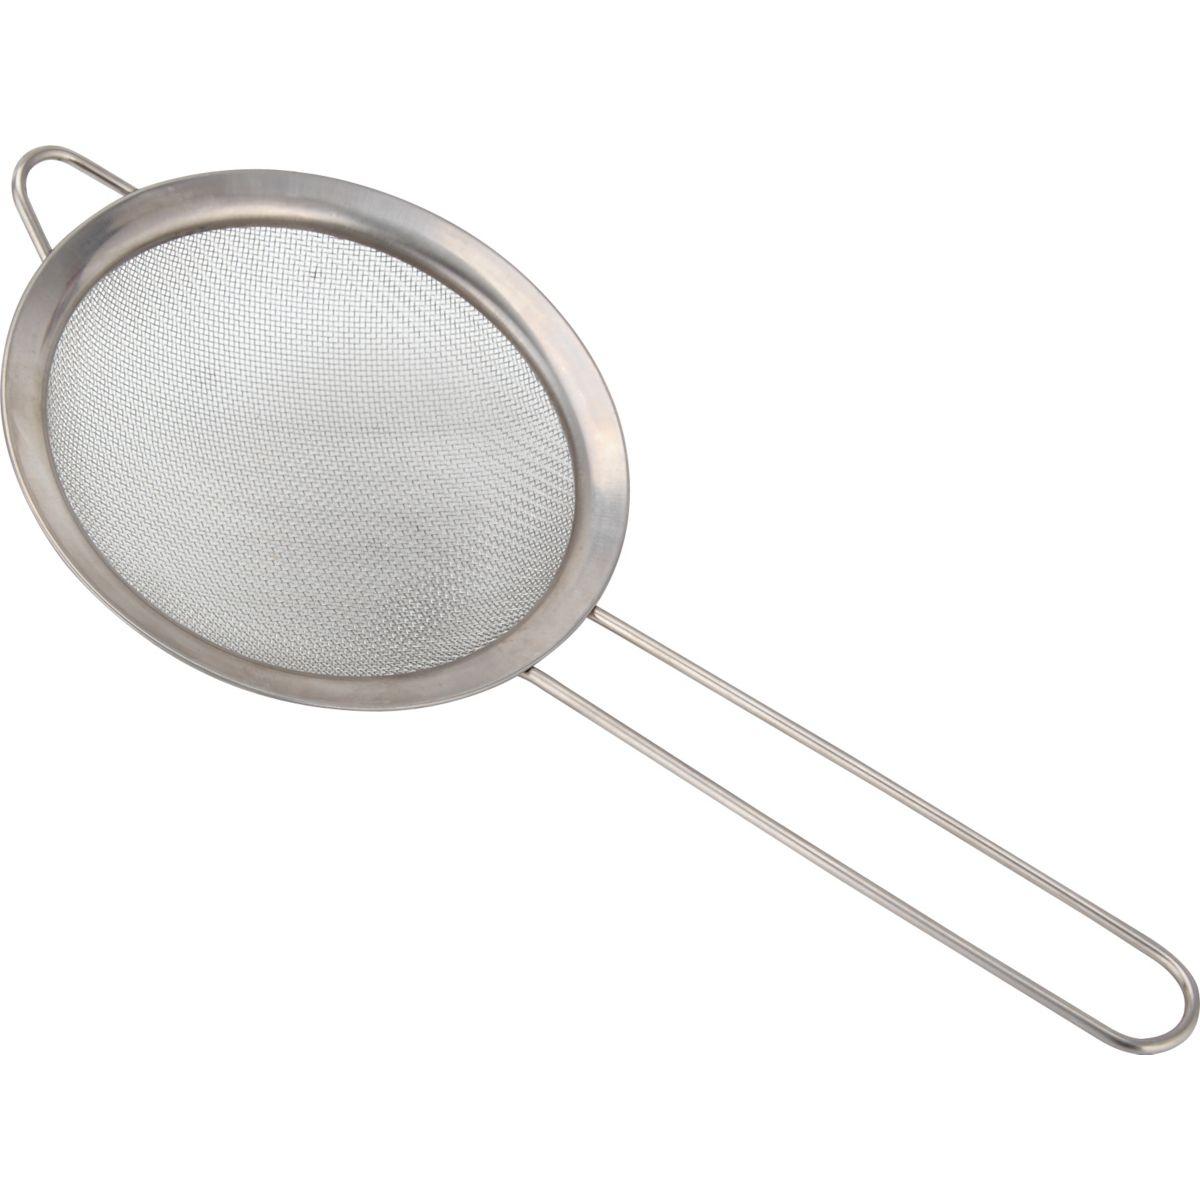 Inox achat vente de inox pas cher for Passette cuisine